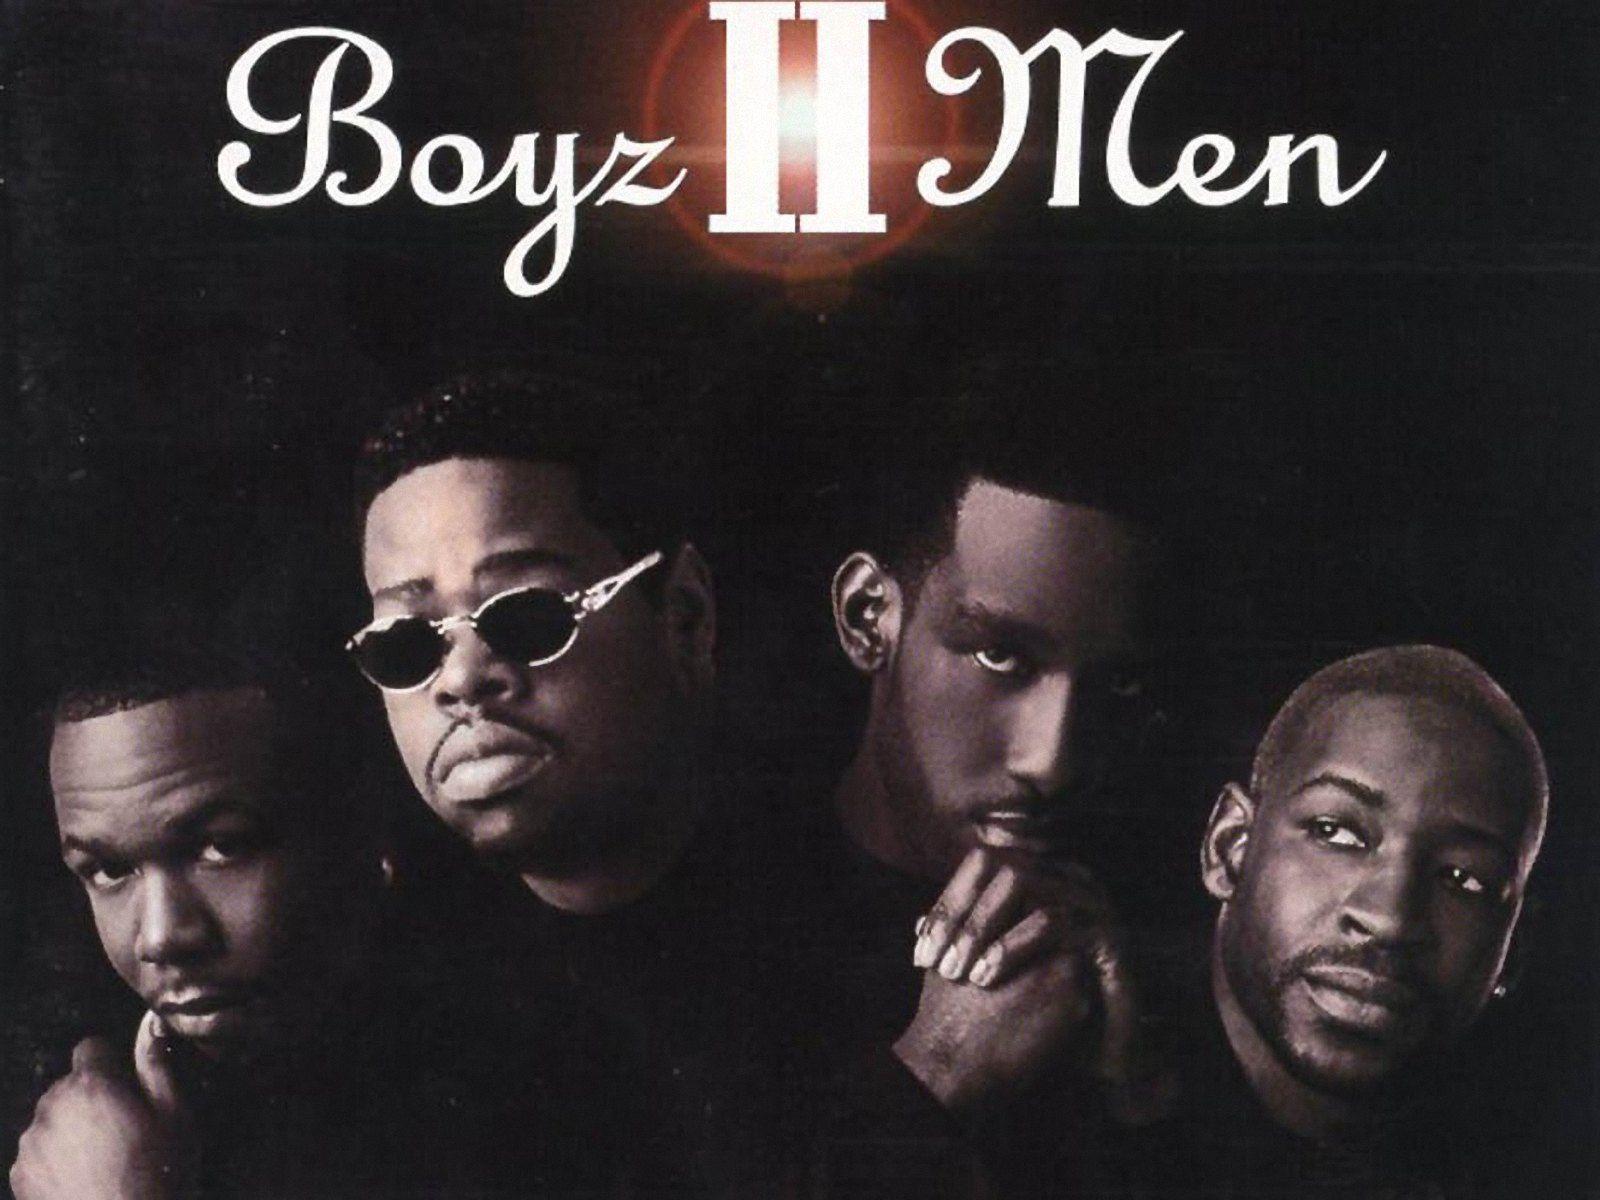 Boyz II Men Cool 1600x1200 Wallpapers 1600x1200 Wallpapers 1600x1200